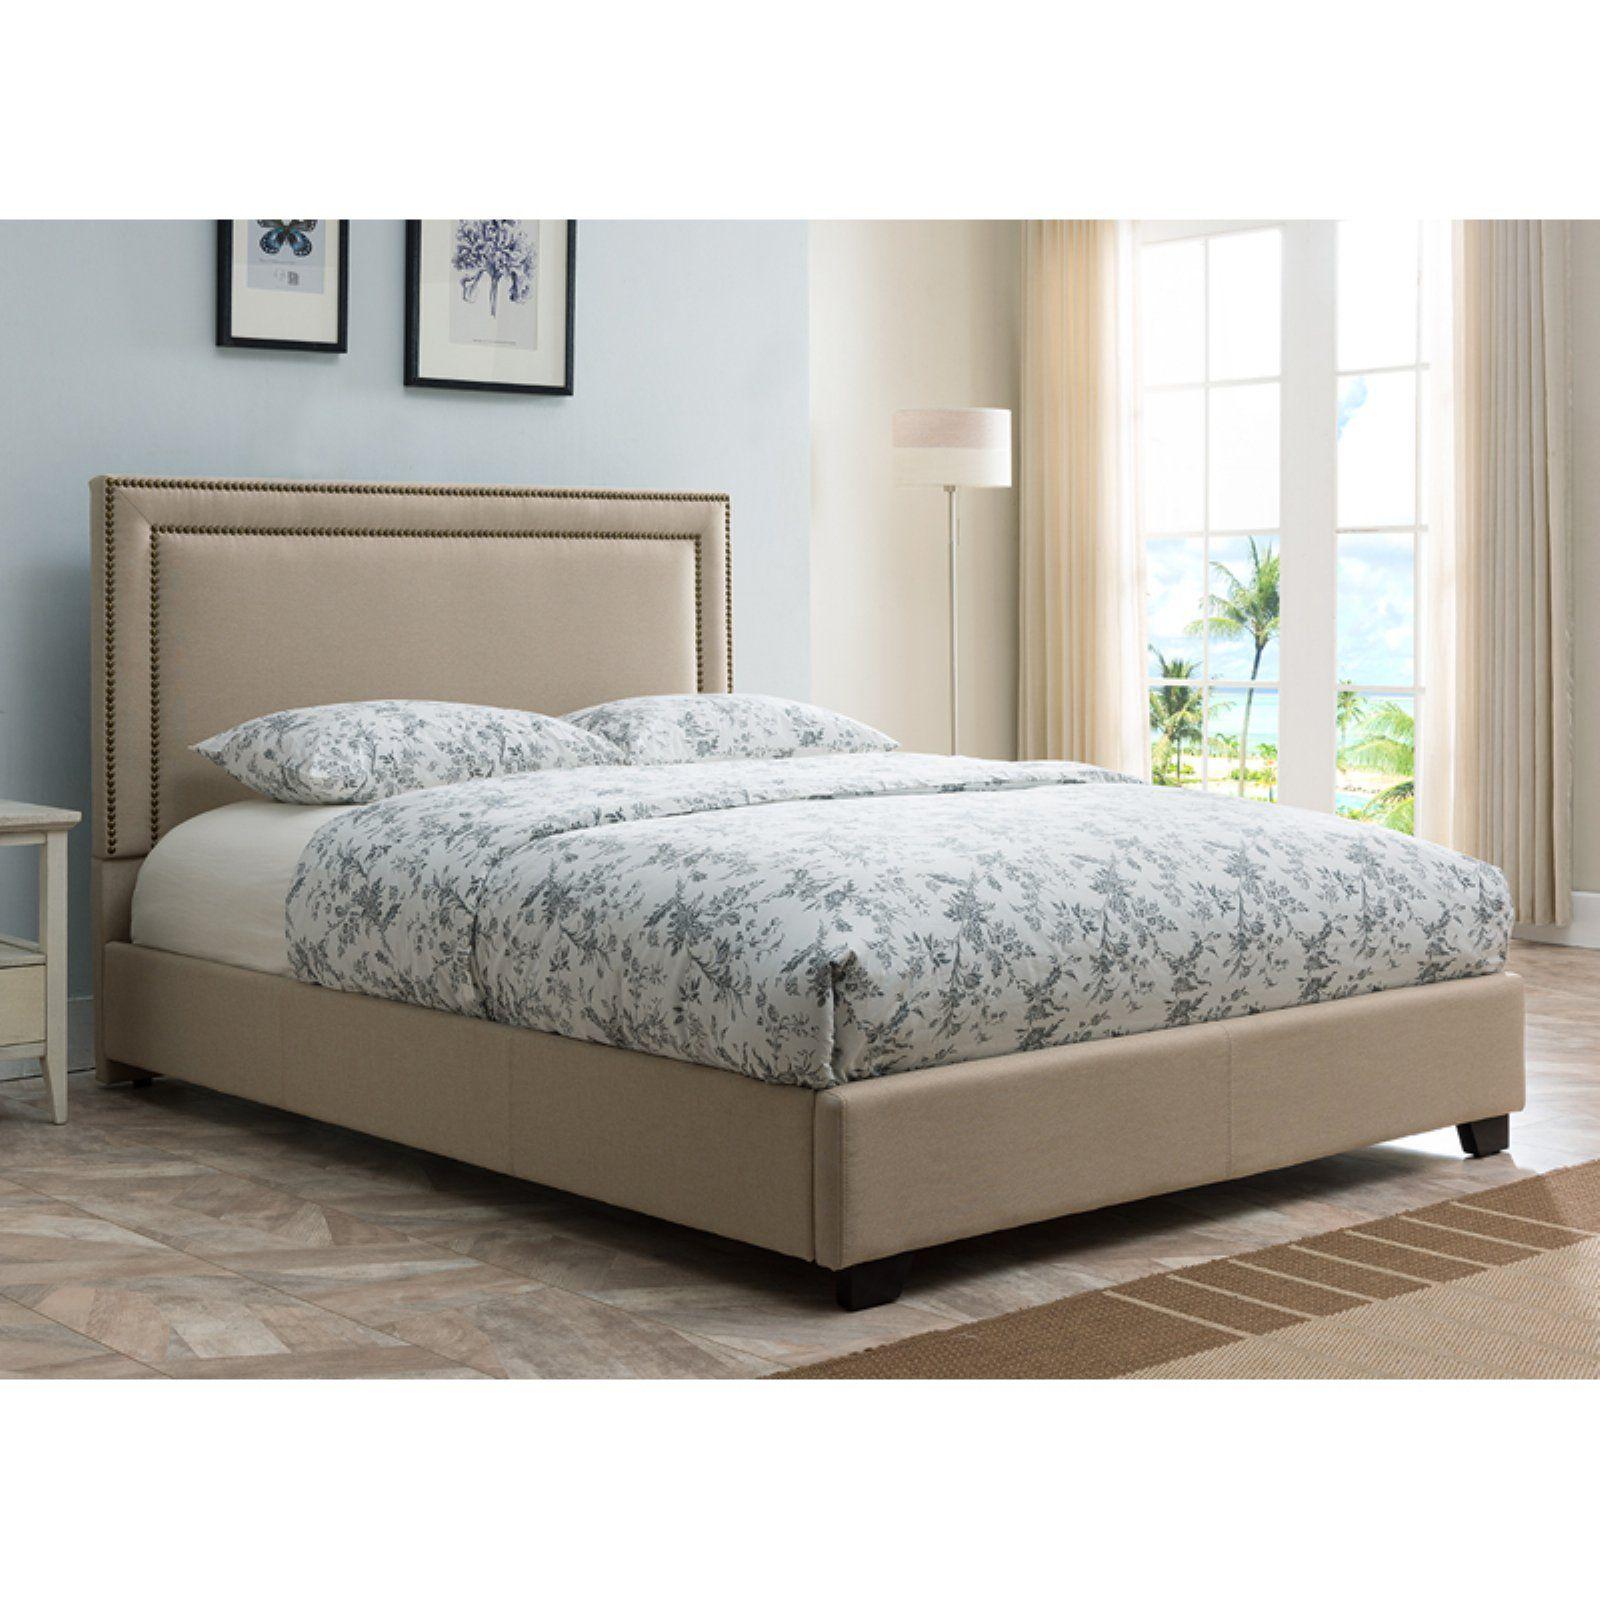 Mantua Banff Platform Bed With Nailhead Trim Taupe Size Queen